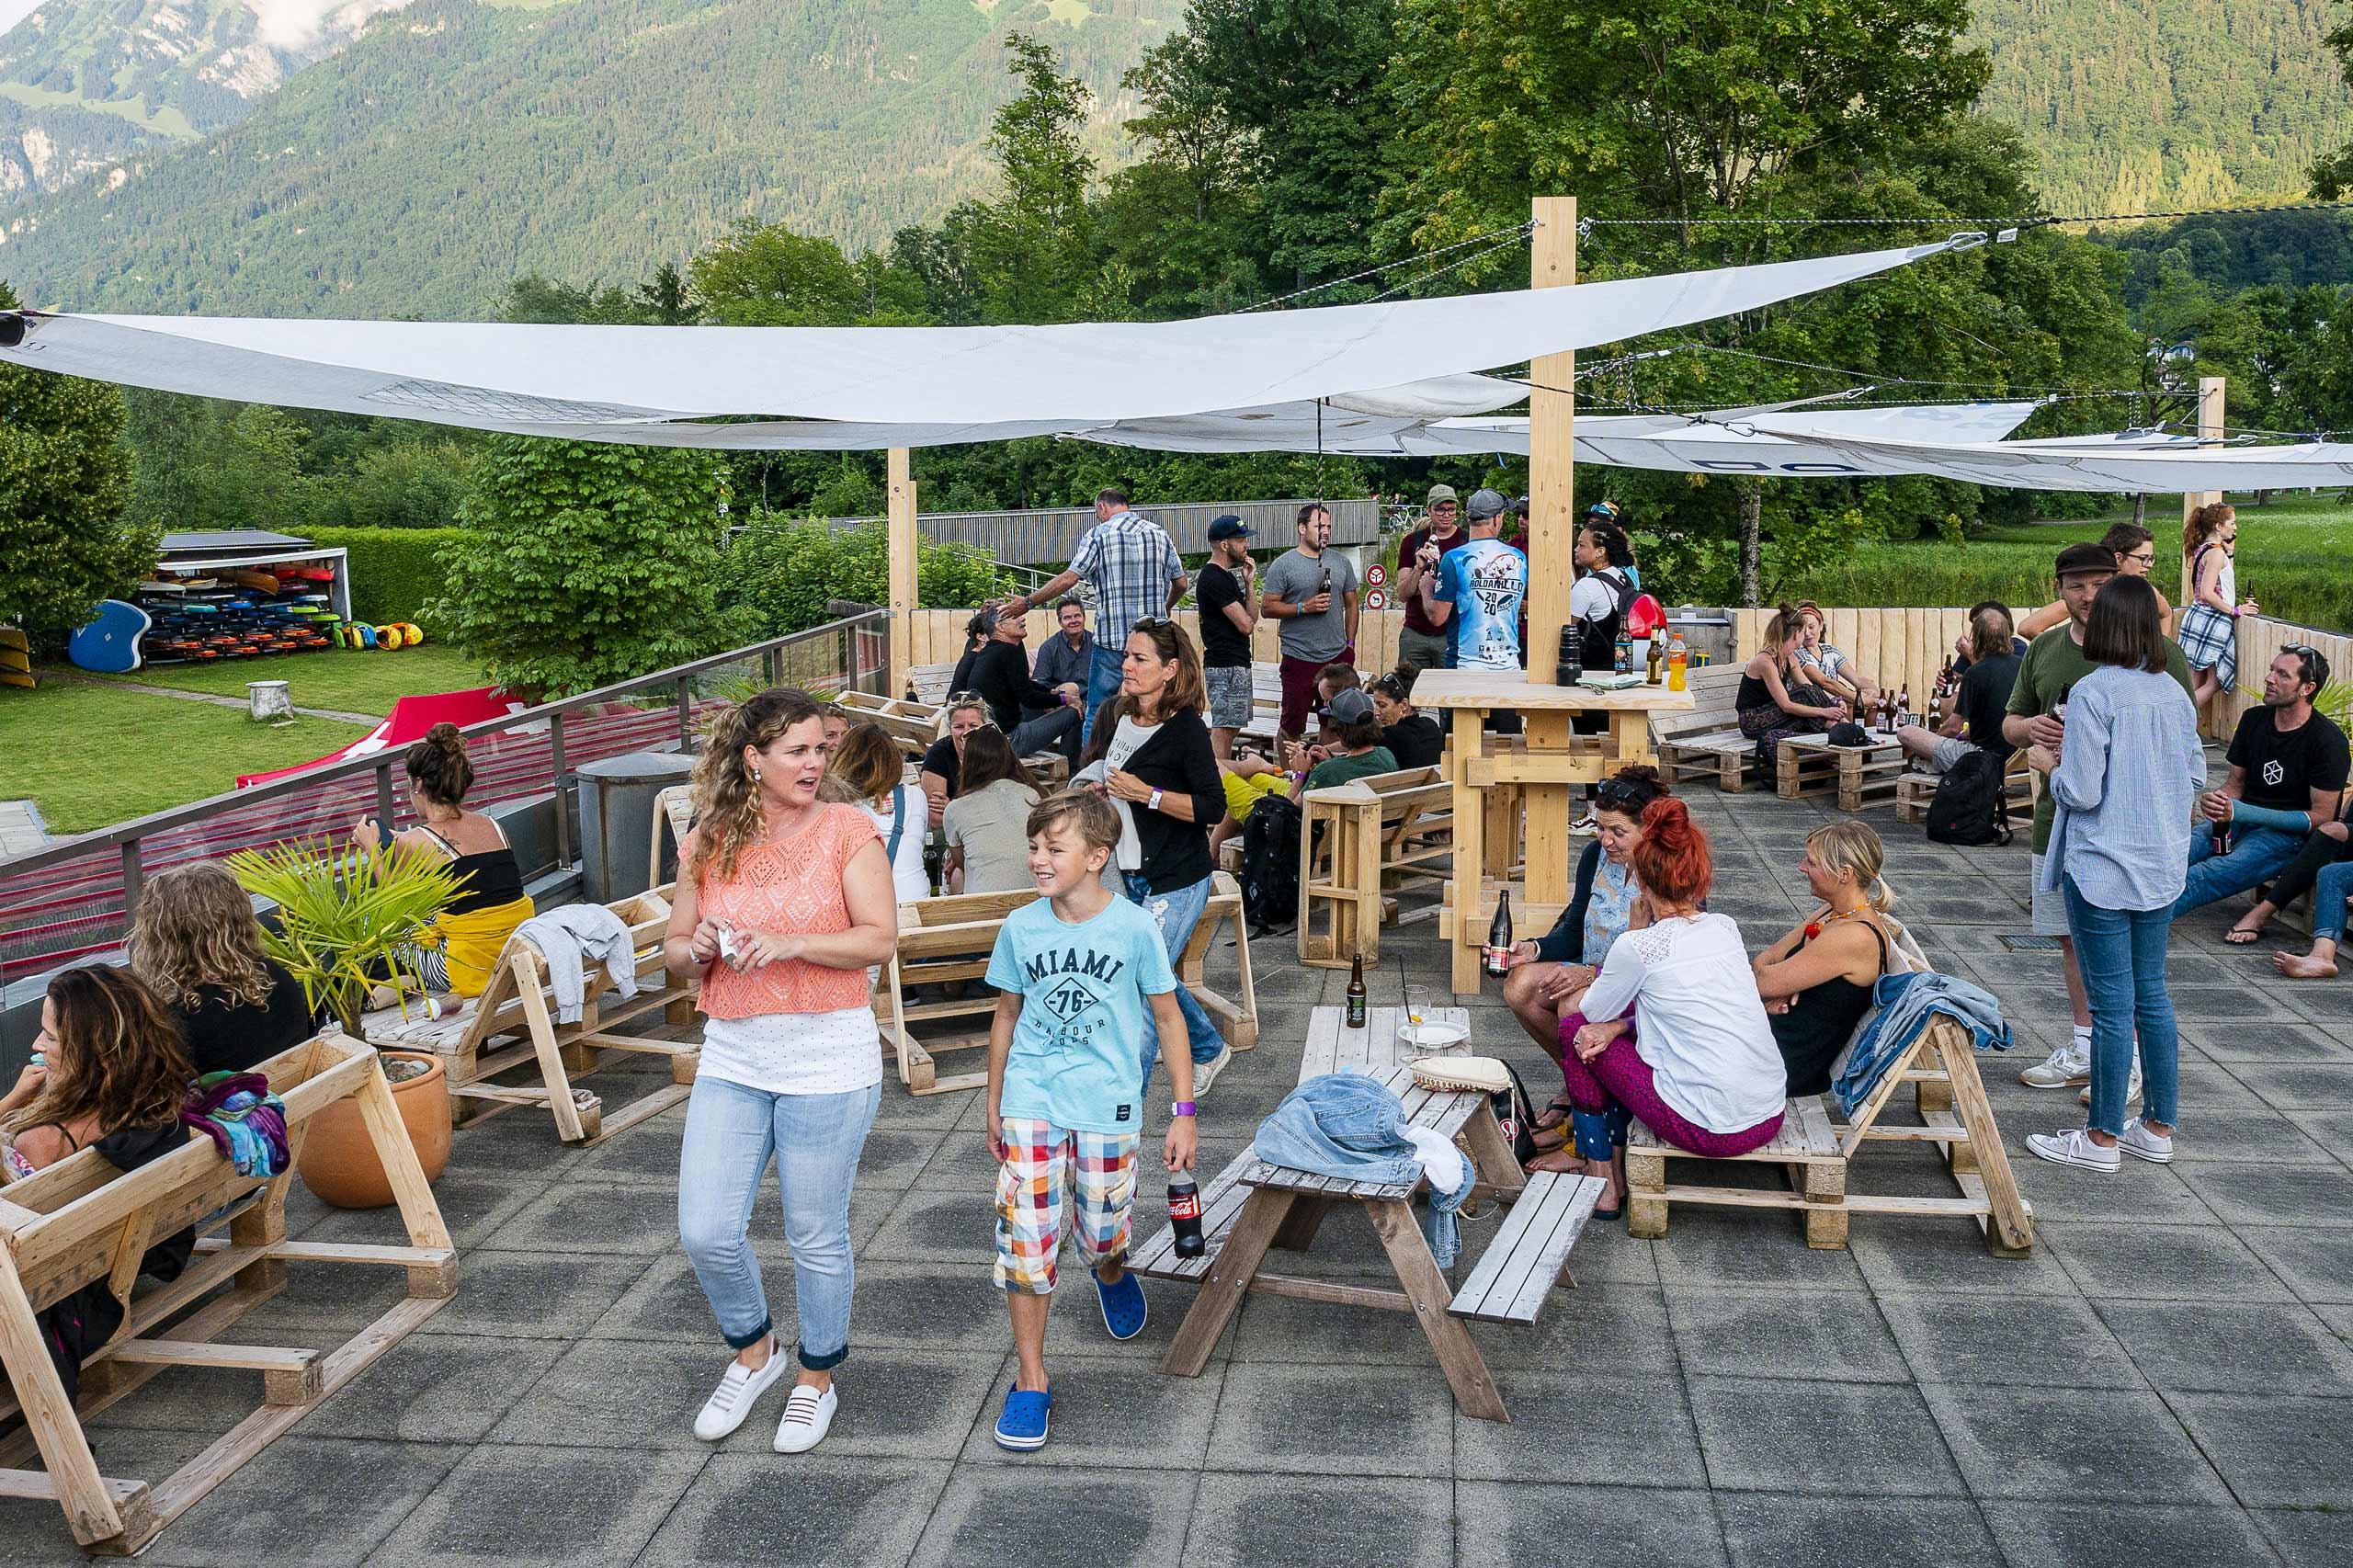 the-berach-strandbad-boenigen-gastronomie-rooftop